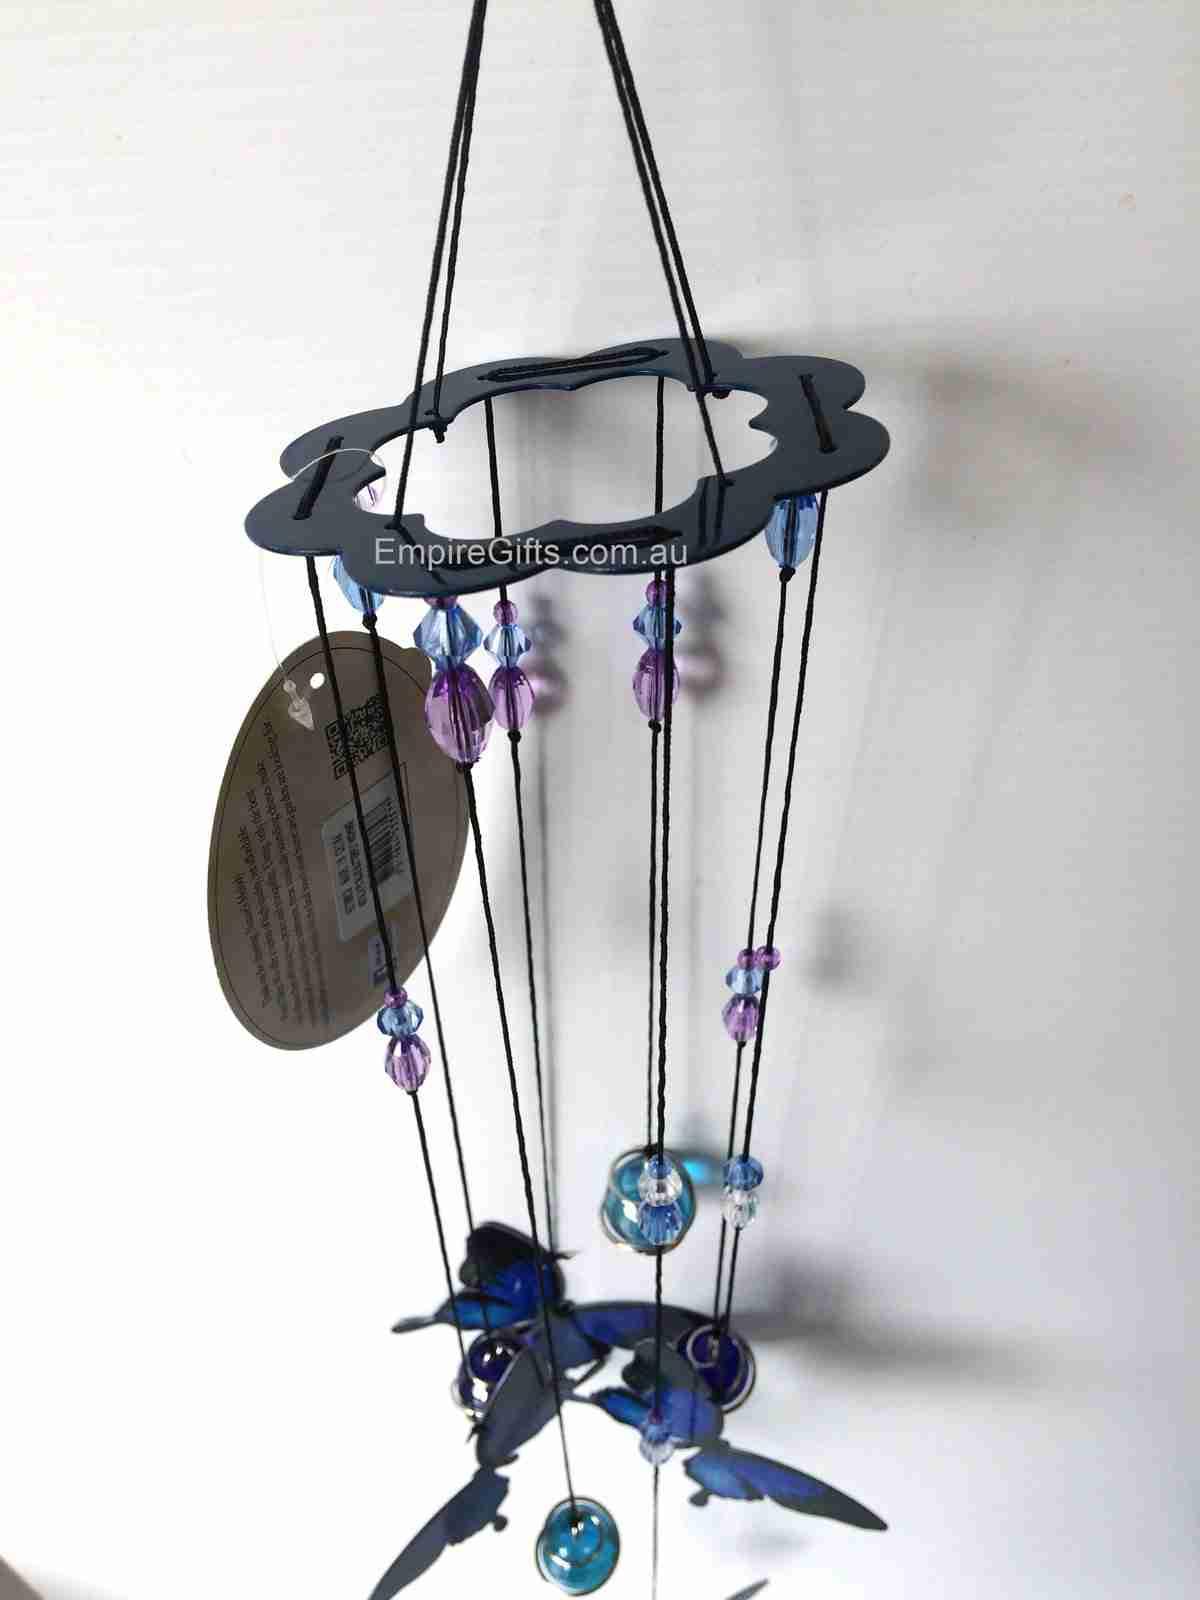 1 x butterfly blue ulysses metal wind chime 5pc mobile. Black Bedroom Furniture Sets. Home Design Ideas